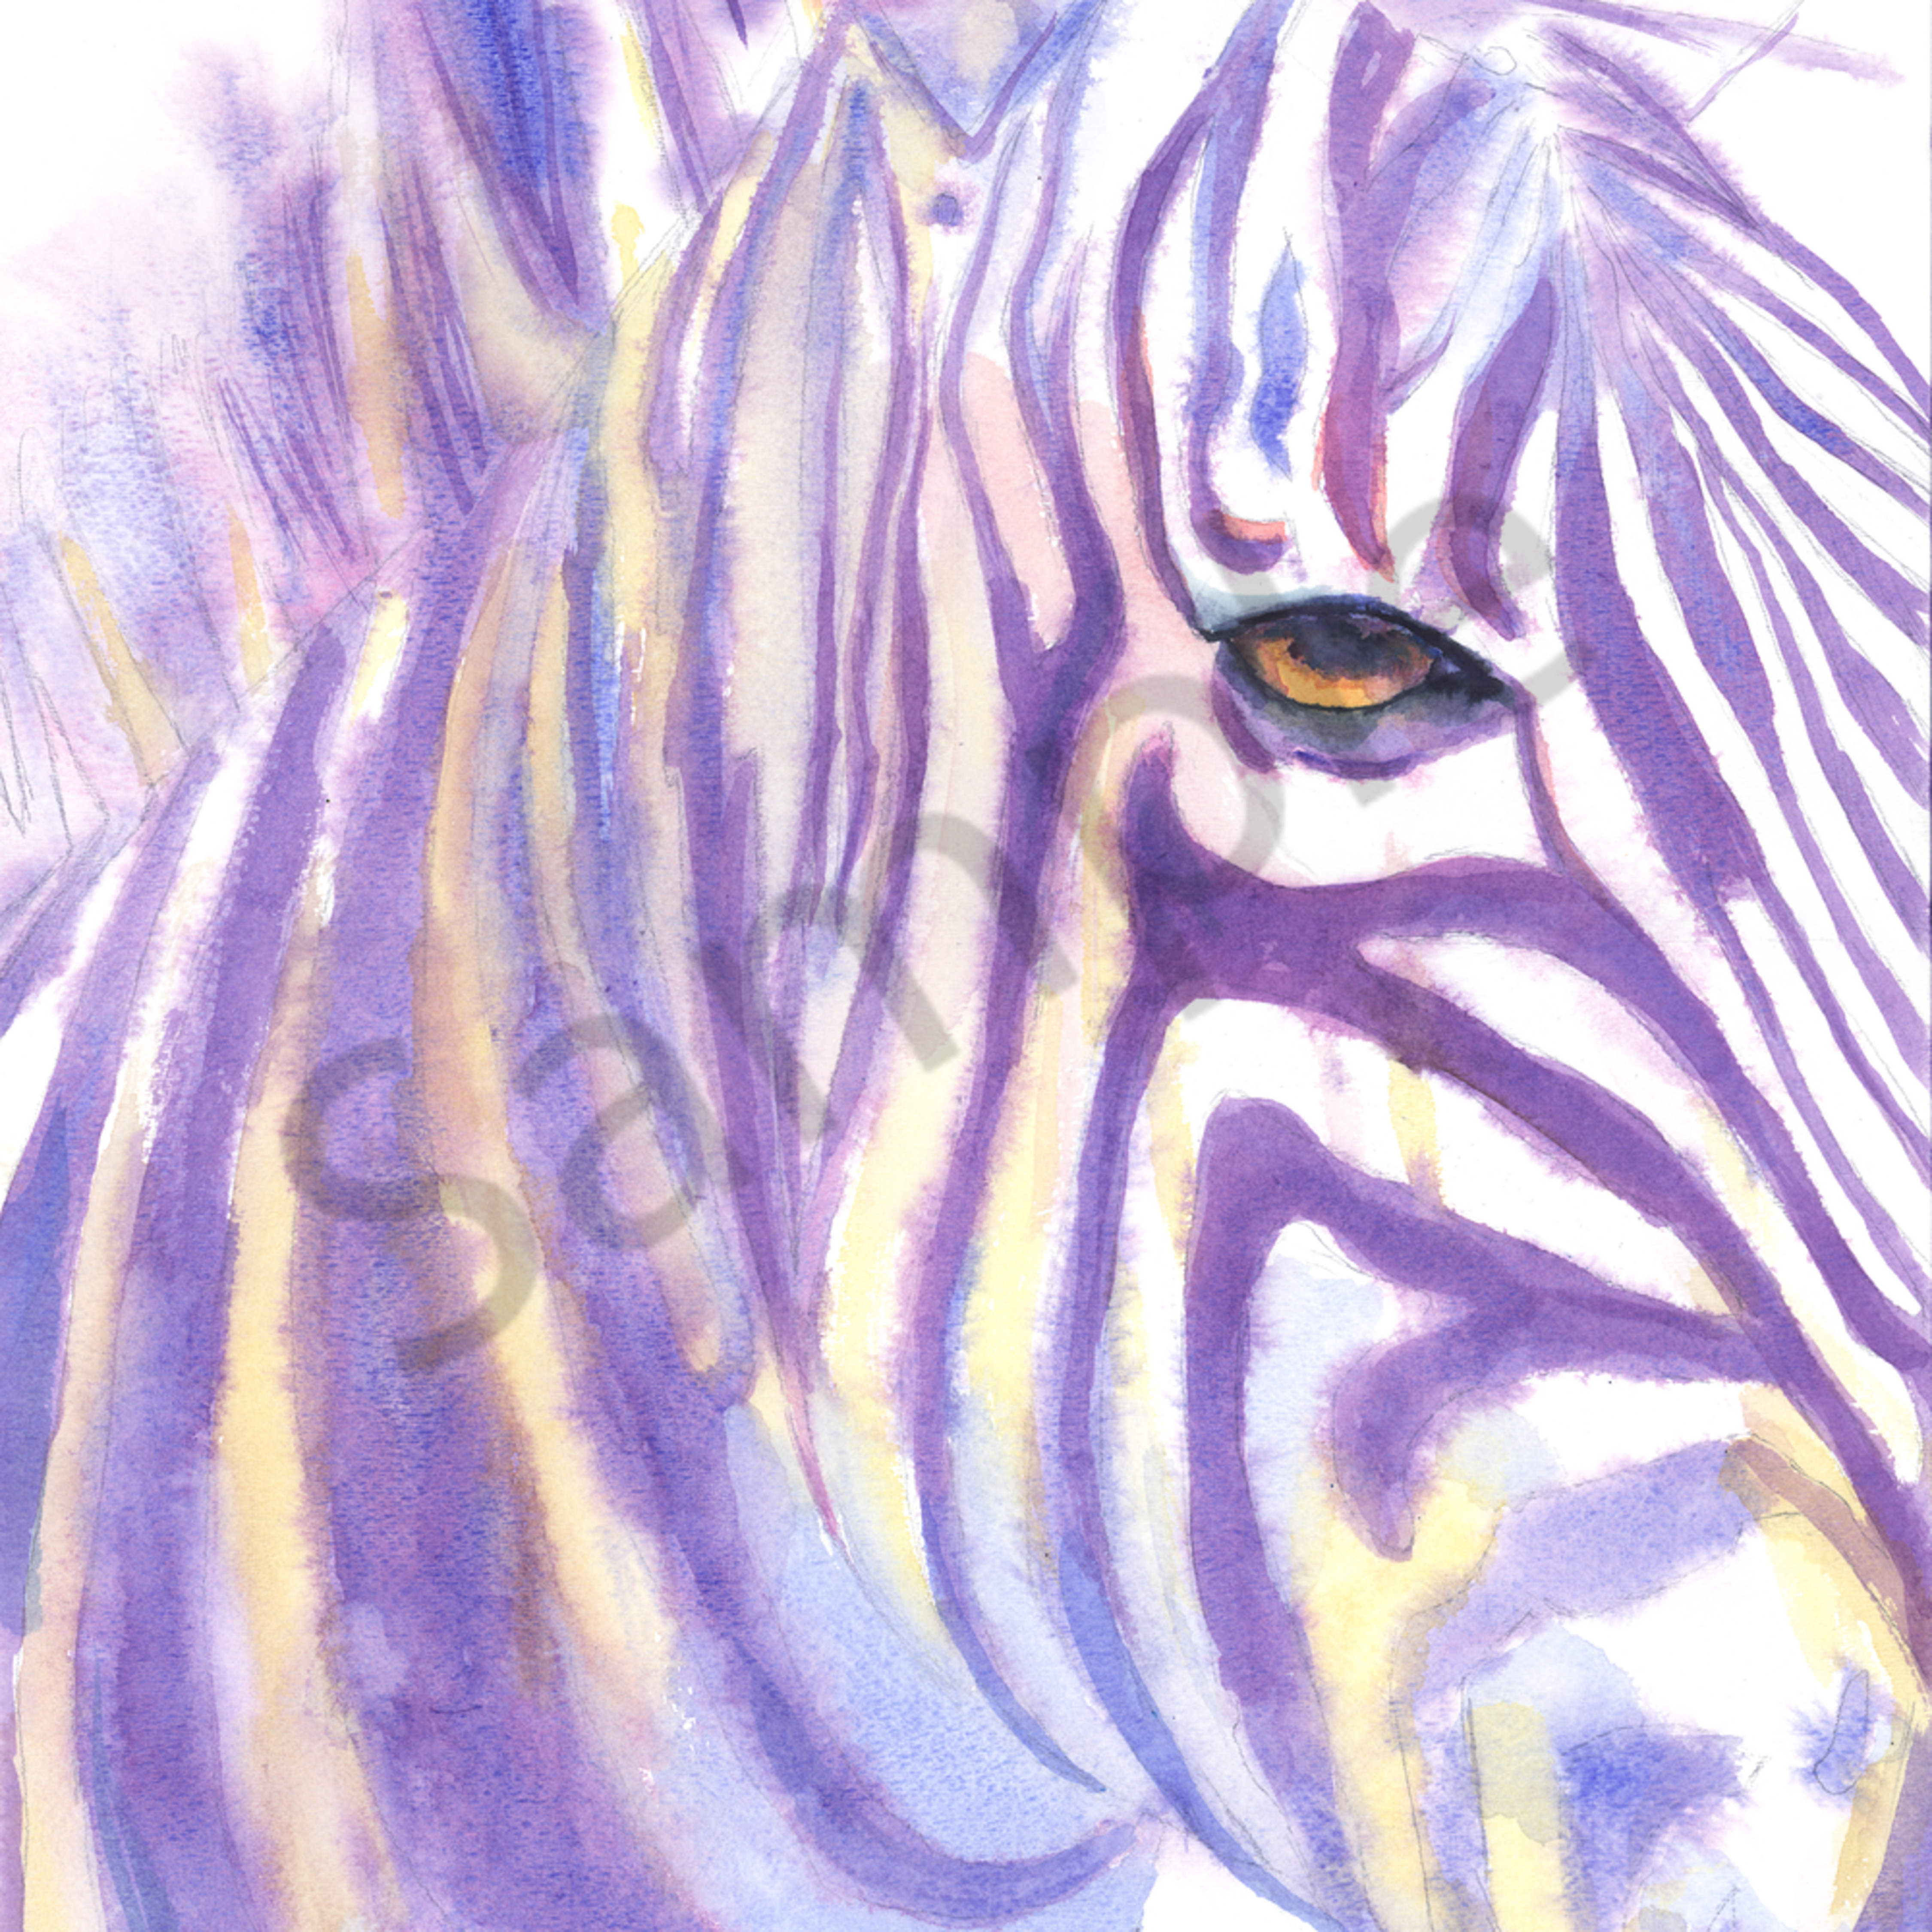 Zebra xuibj1